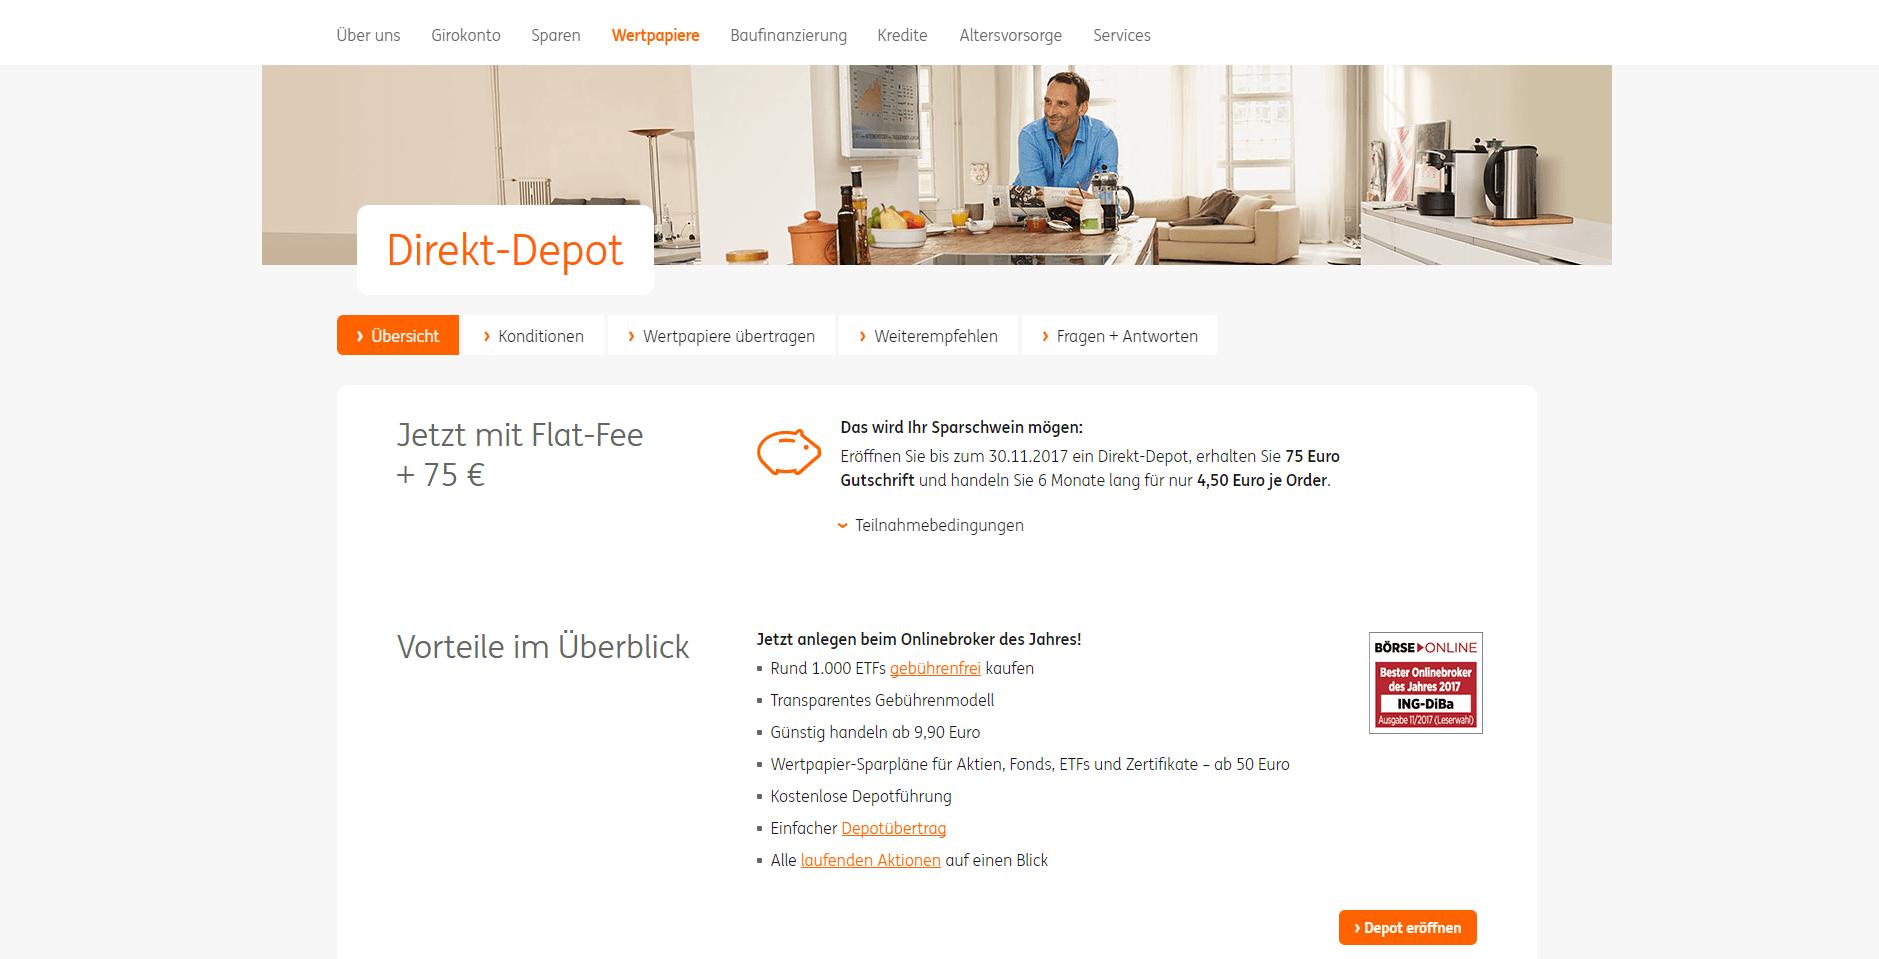 Ing Diba Bewirbt Direkt Depot 75 Euro Gutschrift Und Flat Fee